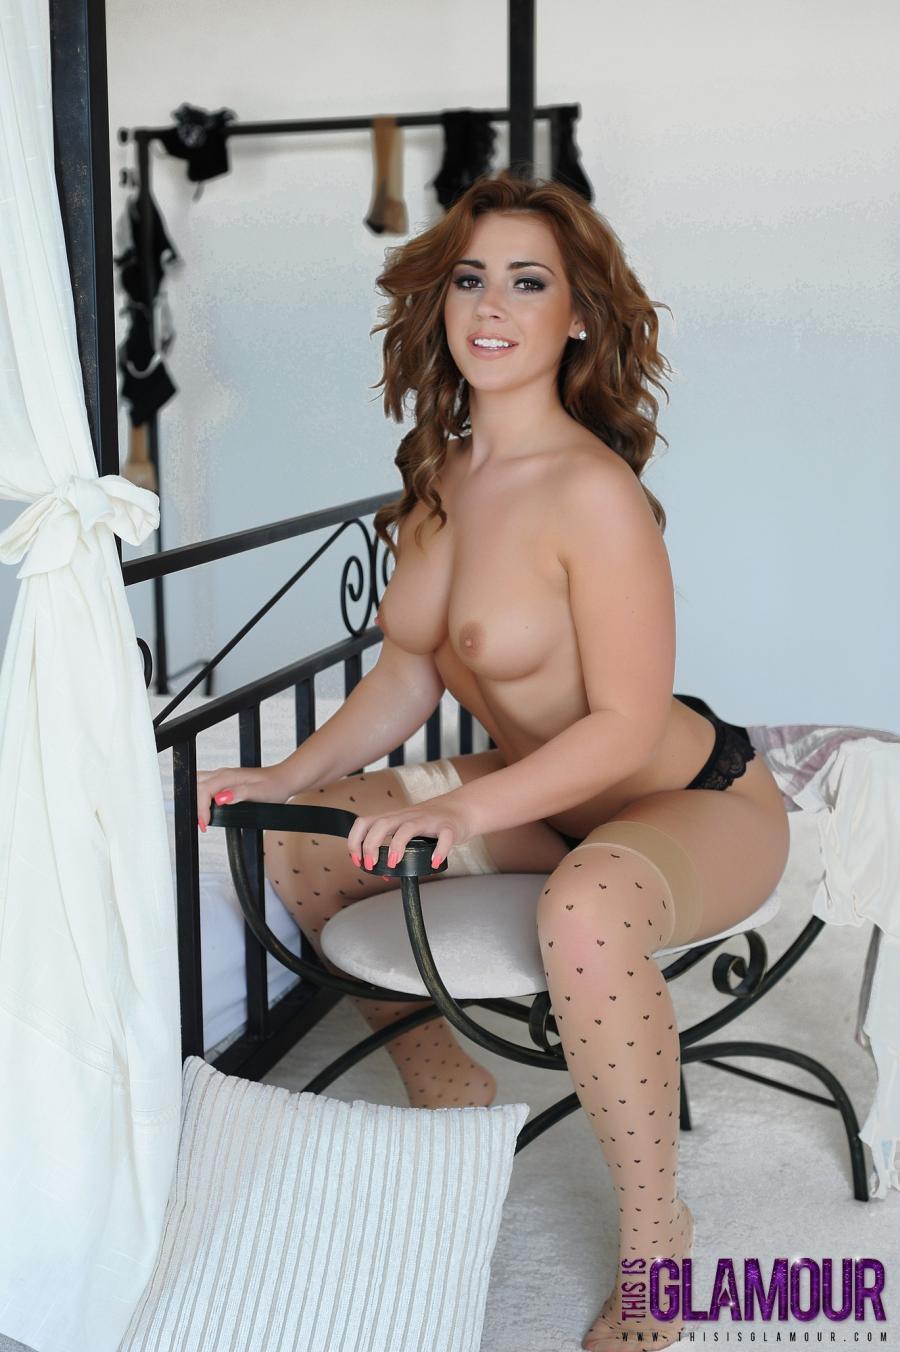 geena-mullins-geile-striptease-in-de-slaapkamer-13